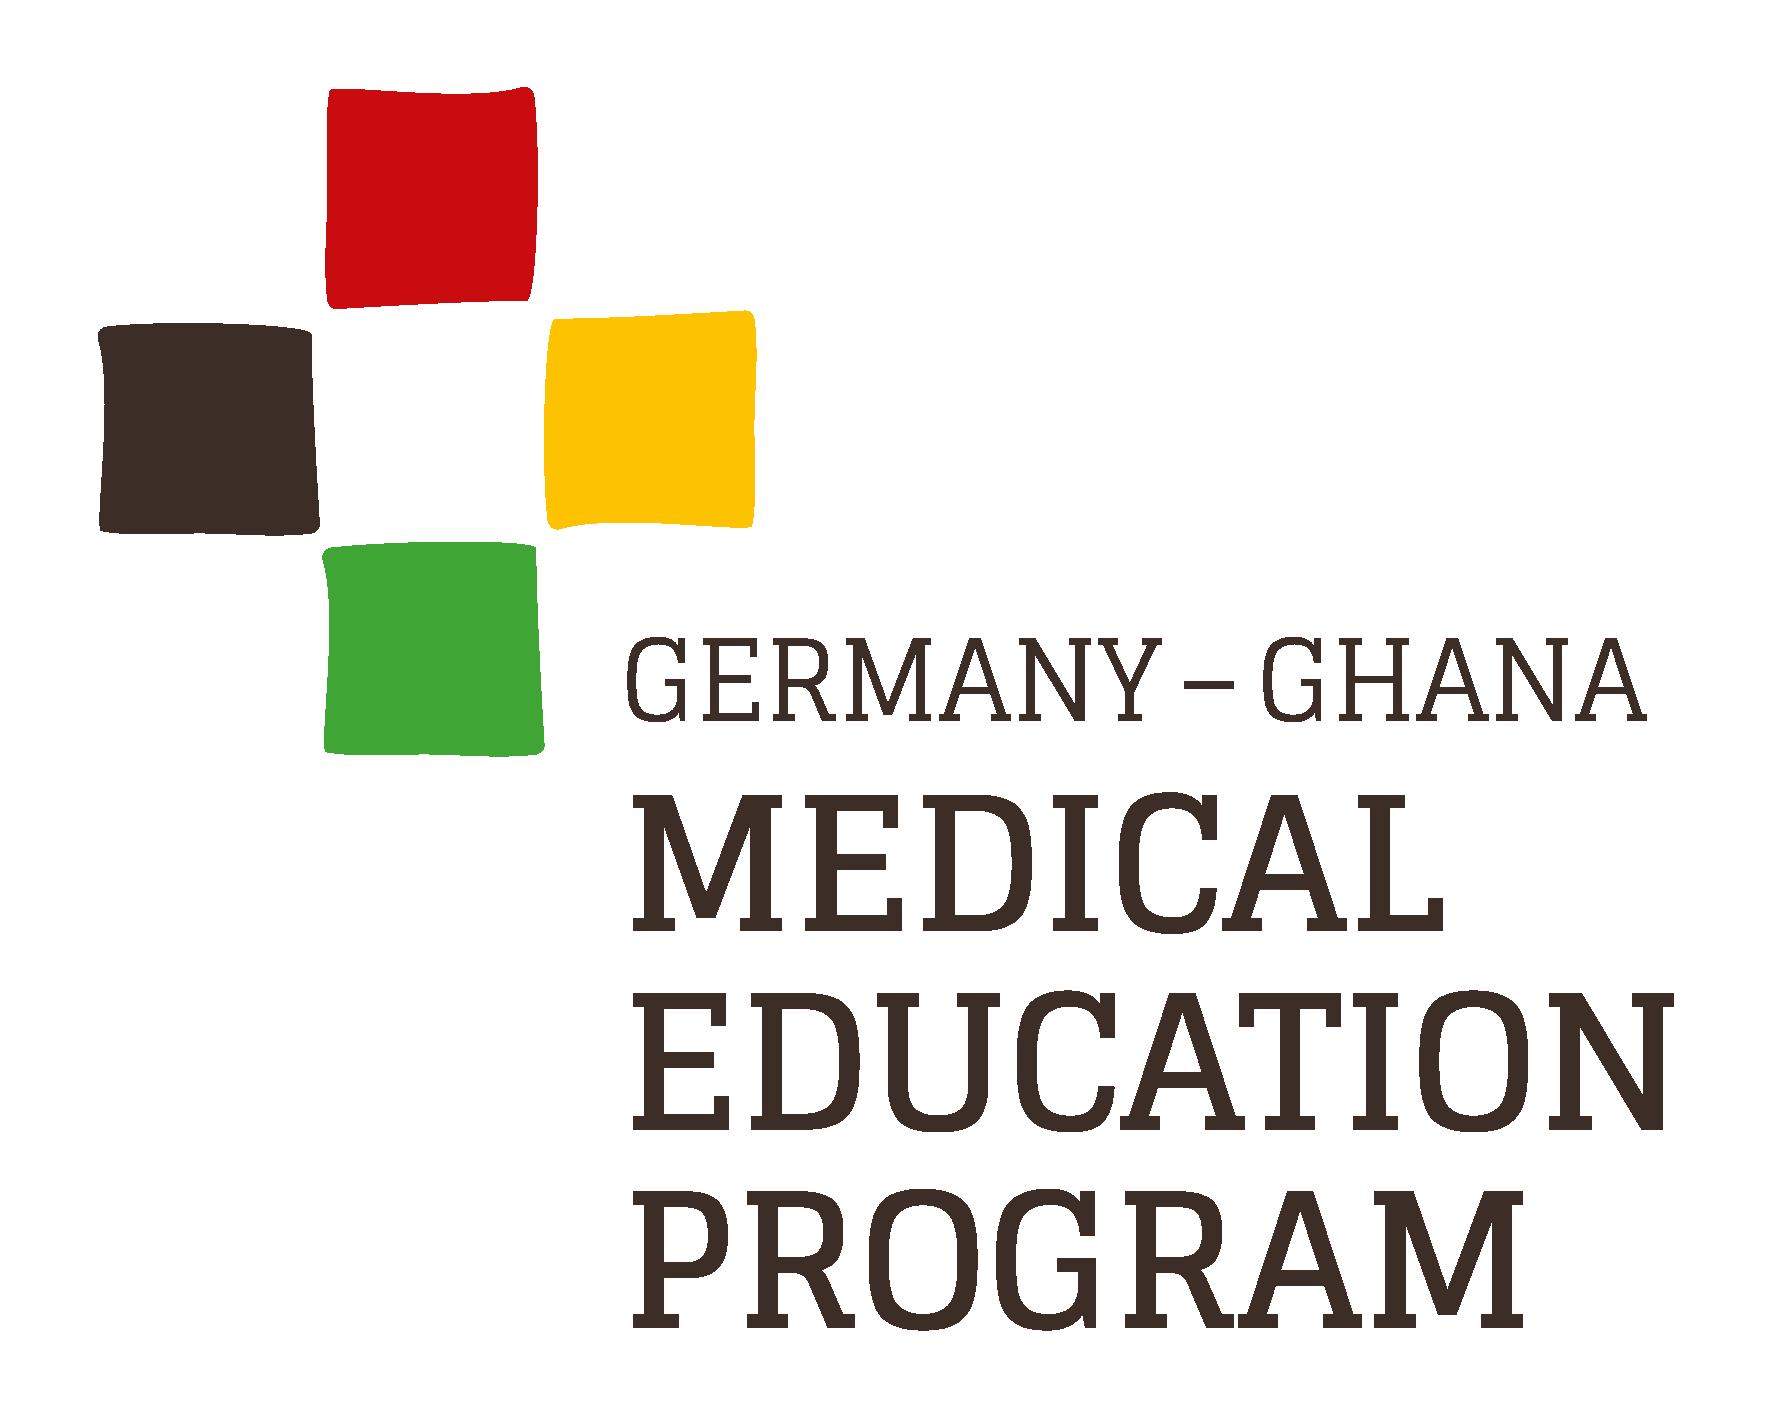 Germany - Ghana | Medical Education Program